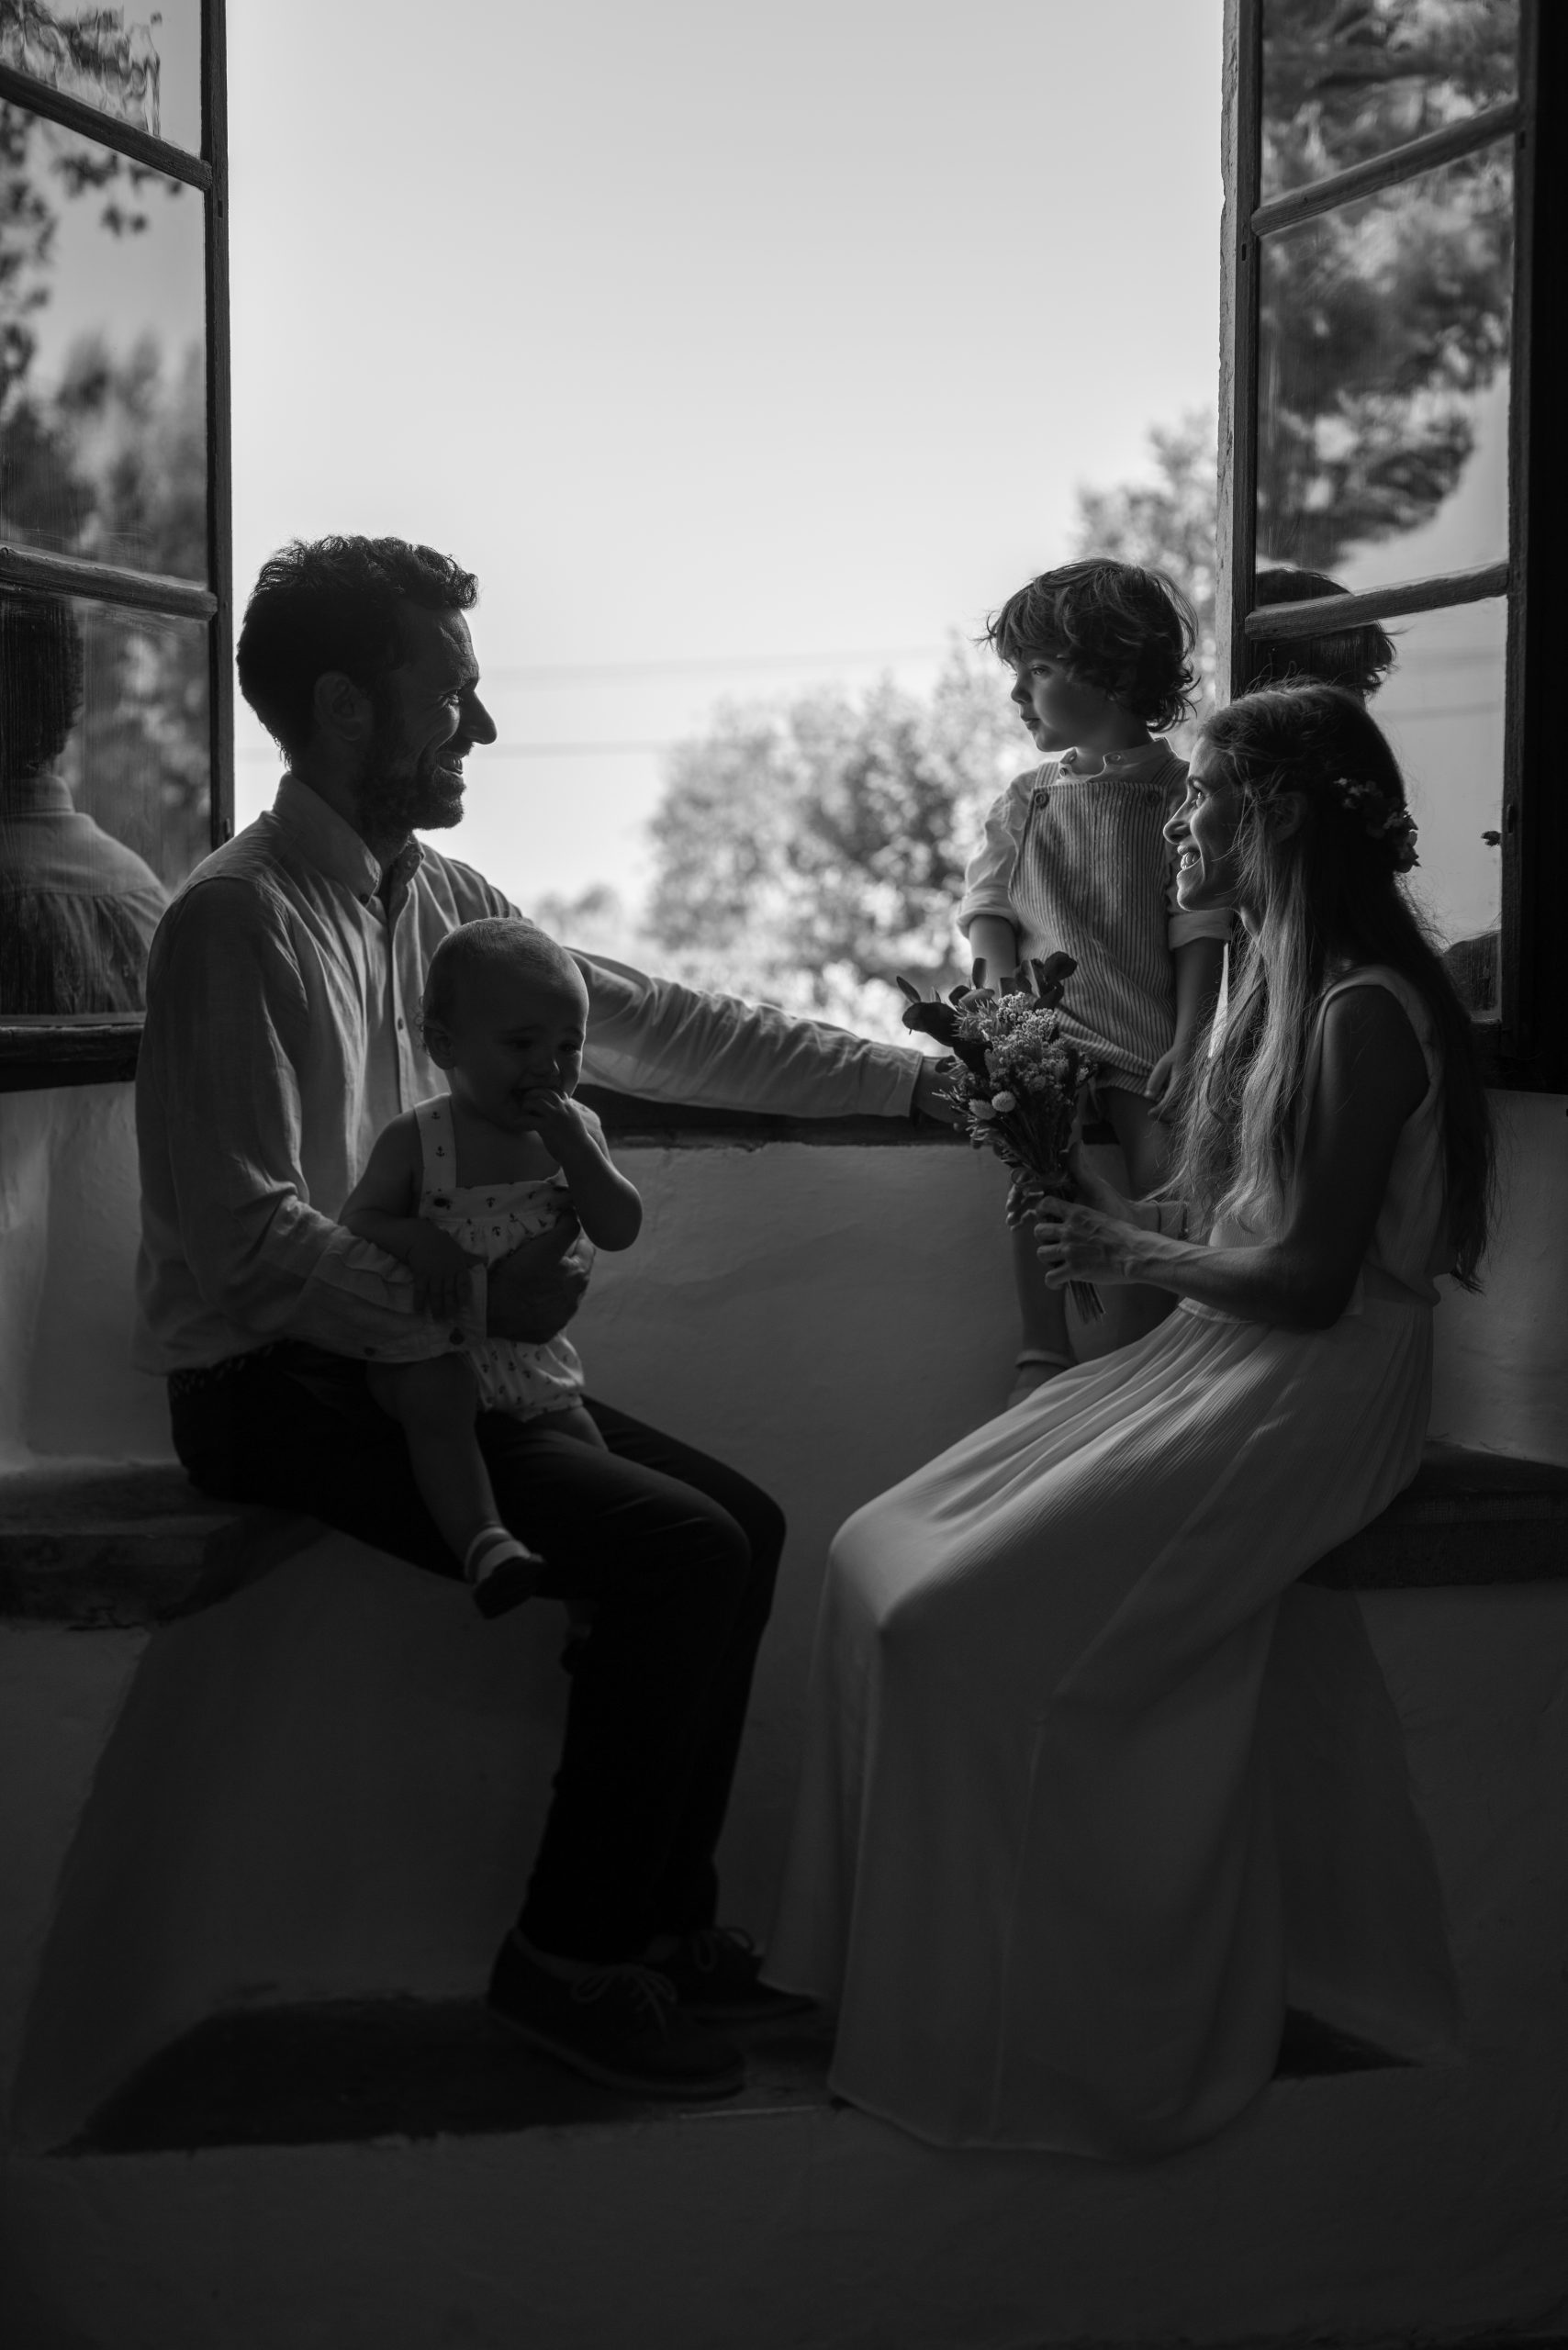 La boda de Leo y Alex, una boda Covid